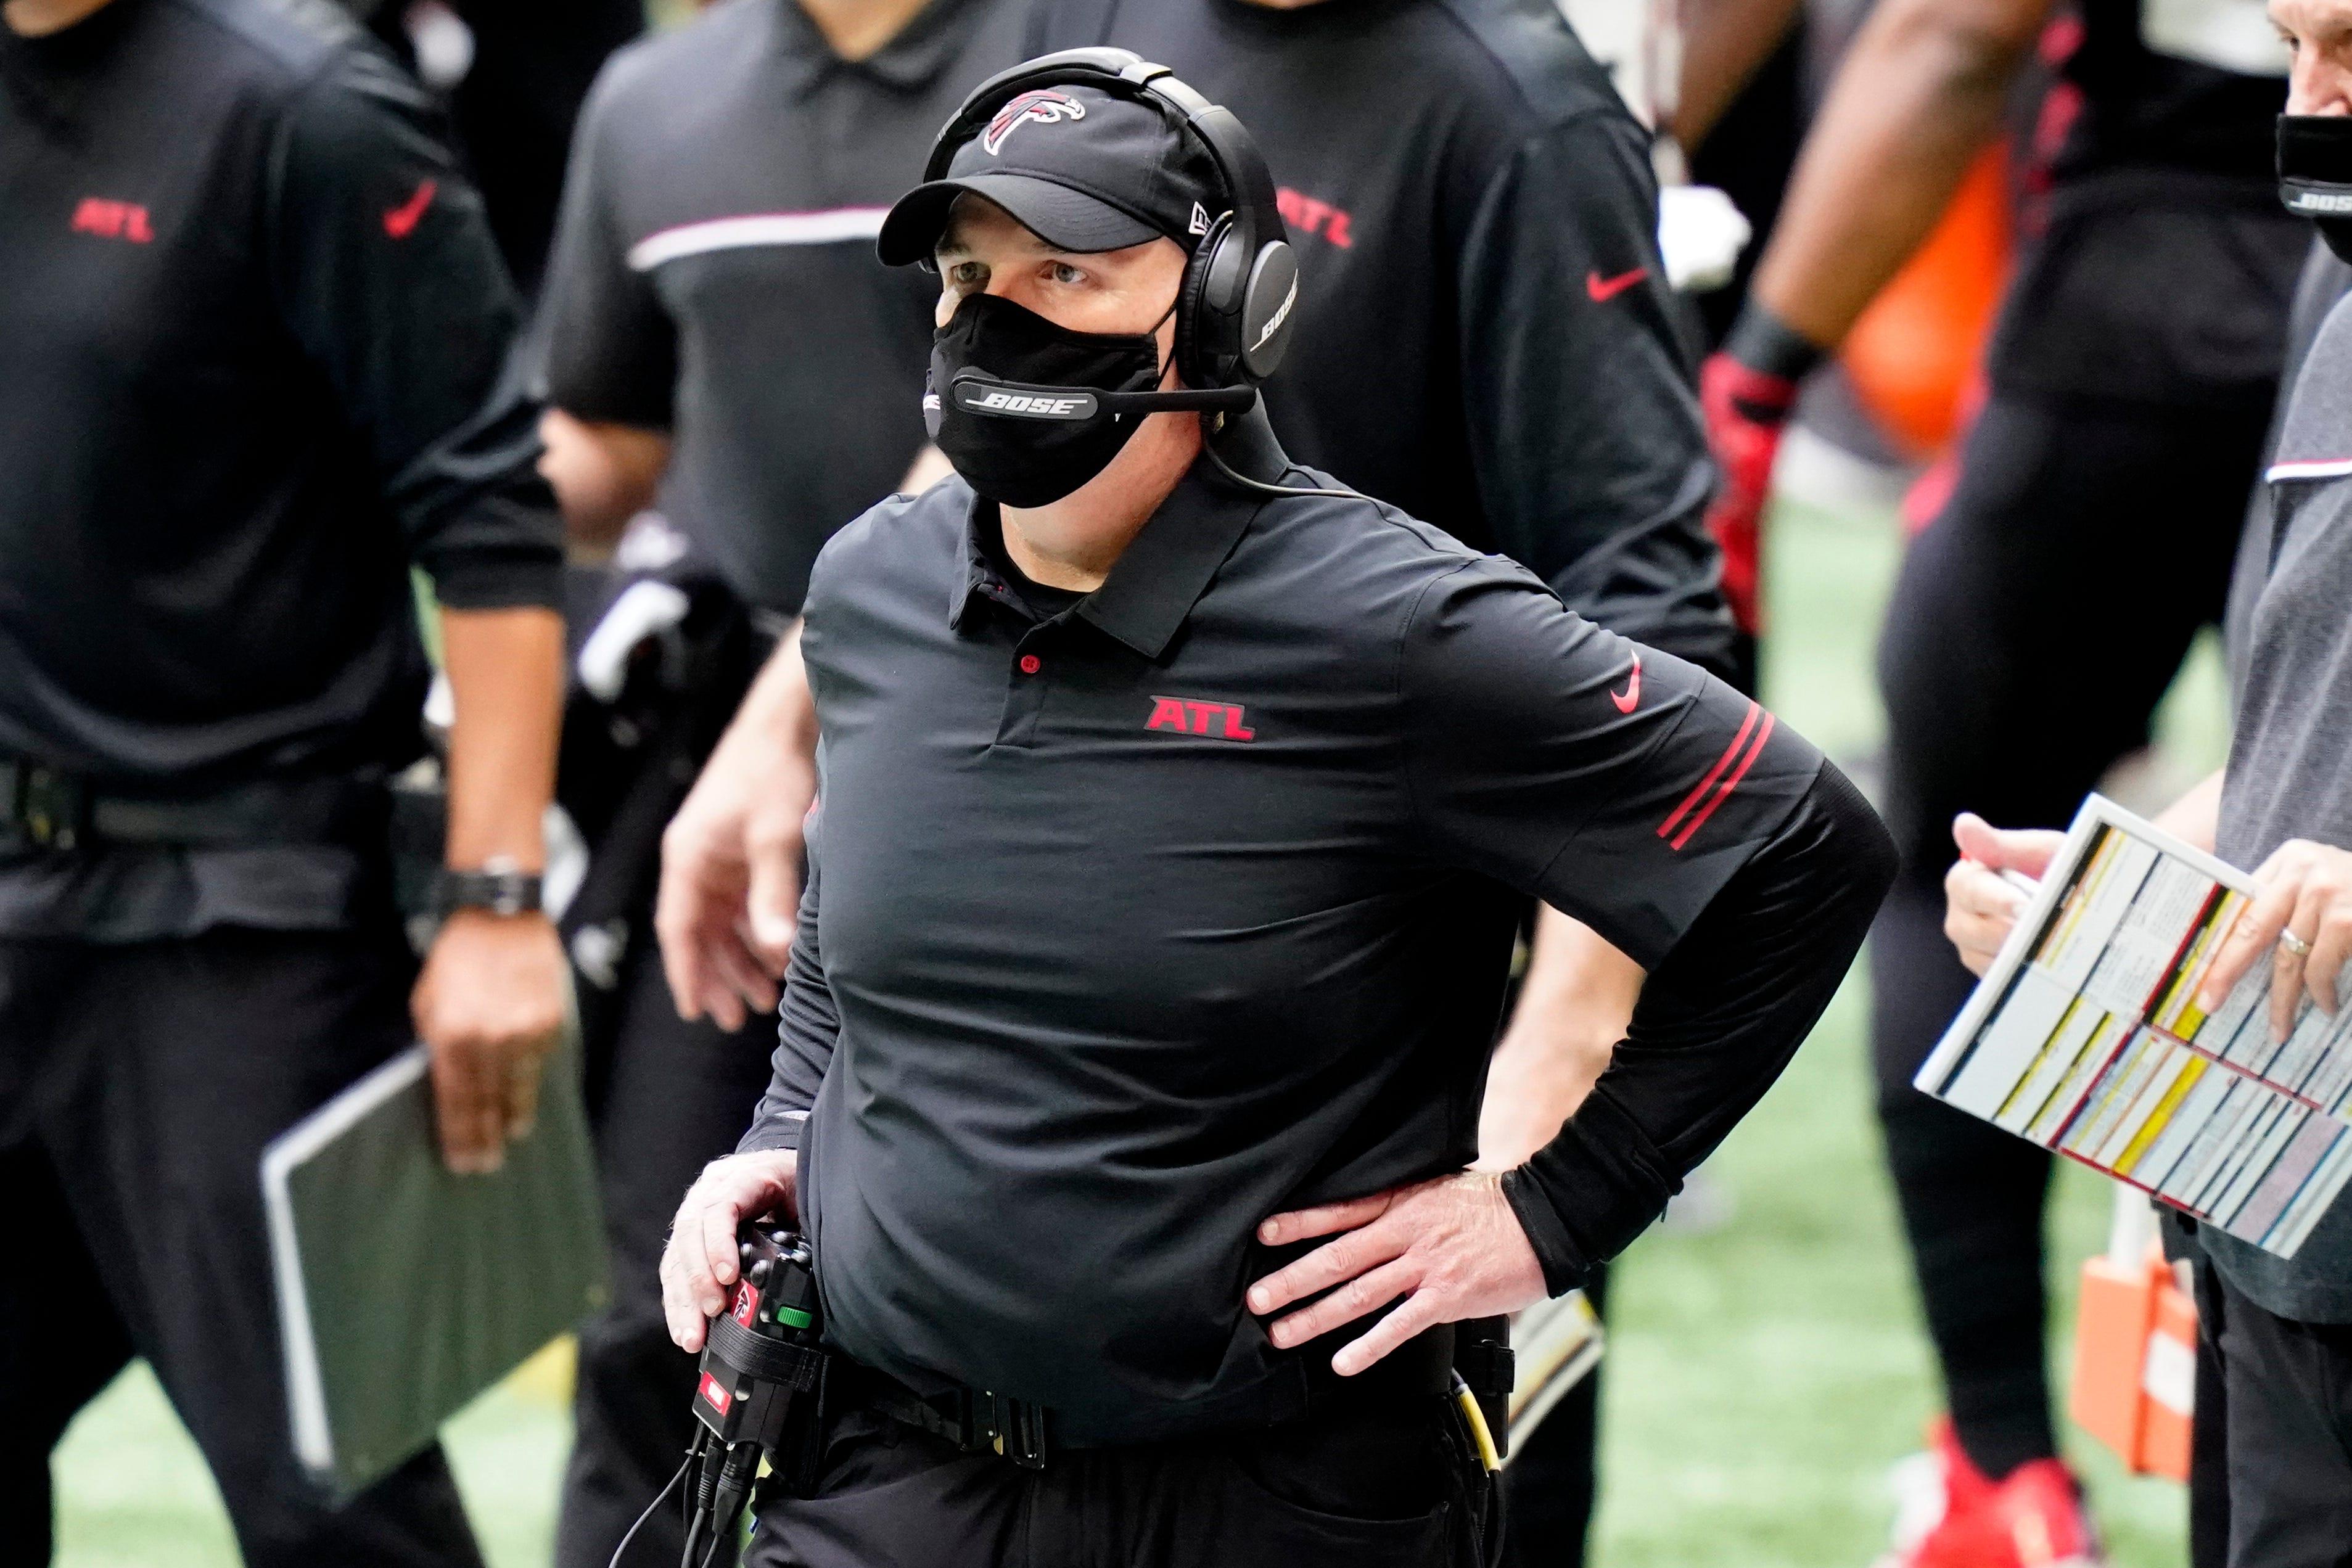 Atlanta Falcons fire coach Dan Quinn, GM Thomas Dimitroff after 0-5 start